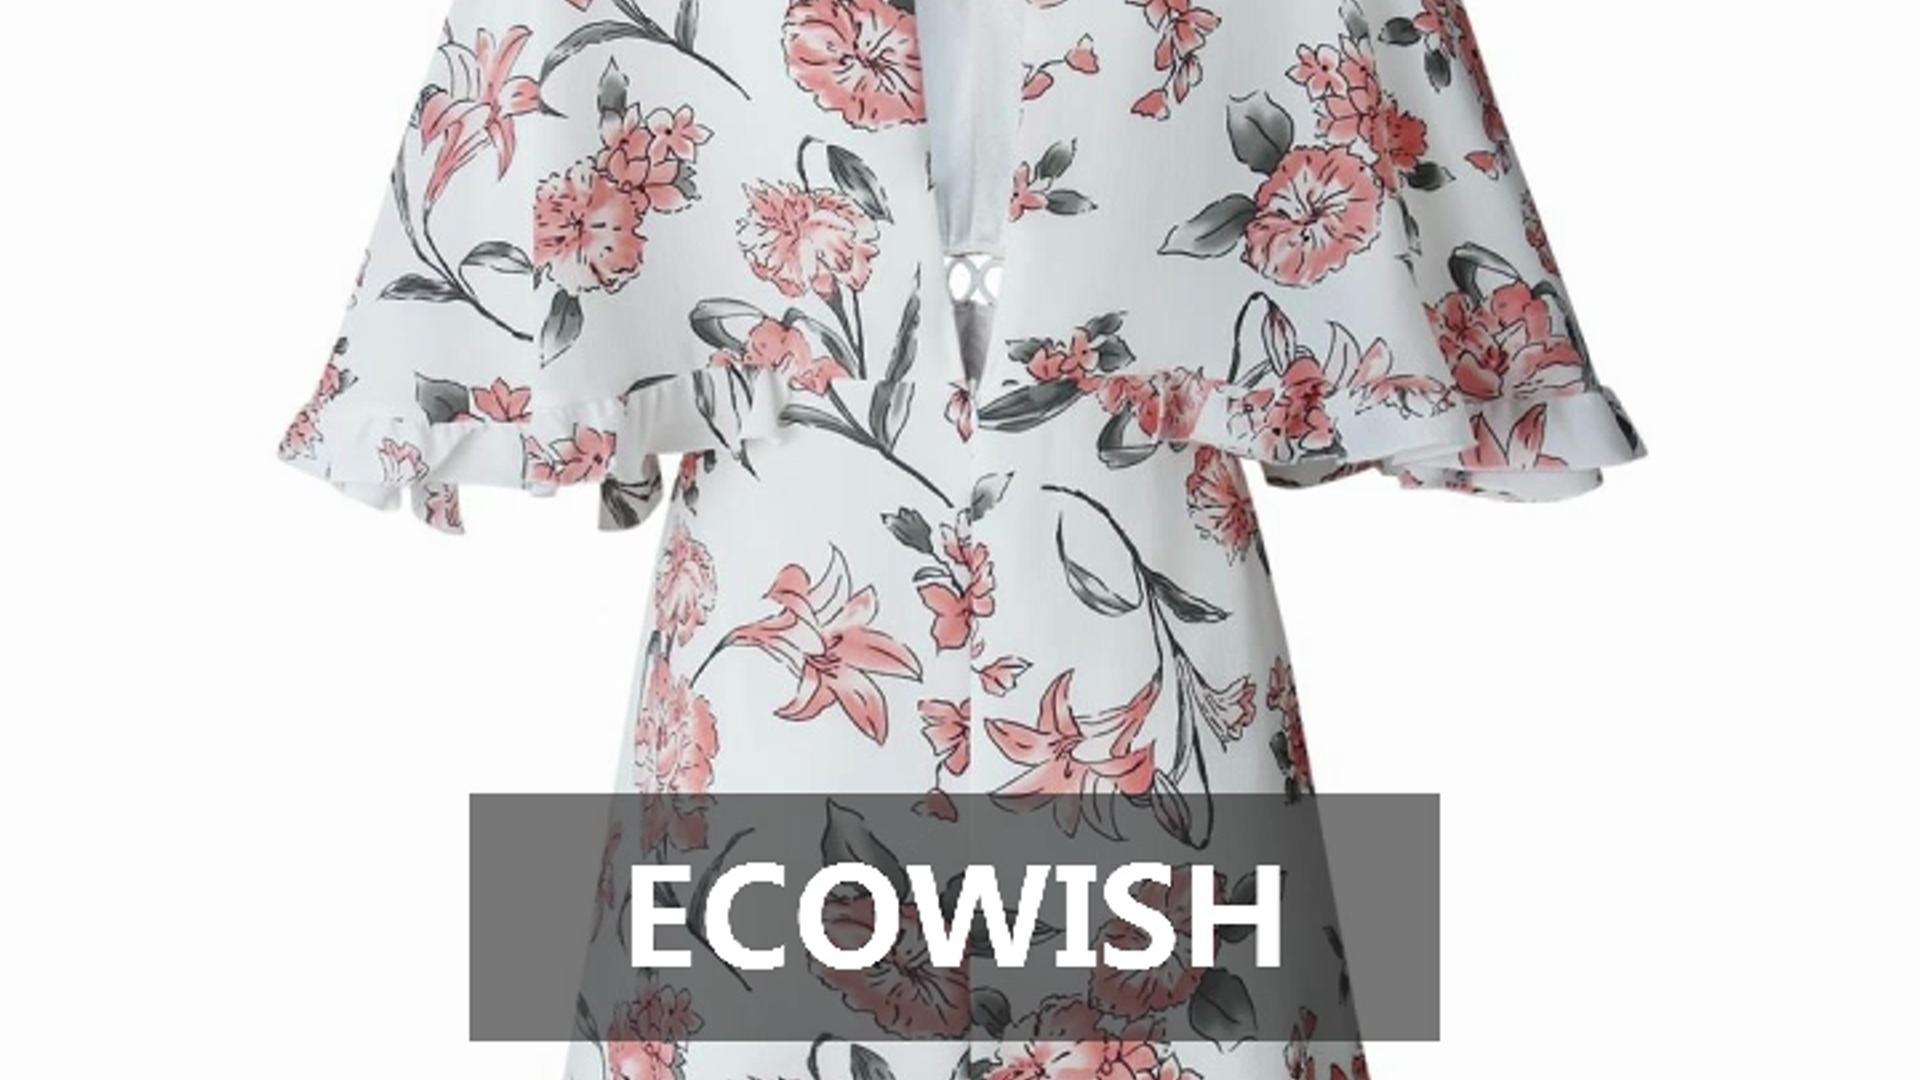 703d62e6e8d63 ECOWISH Women's Dresses Floral Print V Neck Batwing Ruffle Hem Short Sleeve  Hollow Out Boho Mini Dre